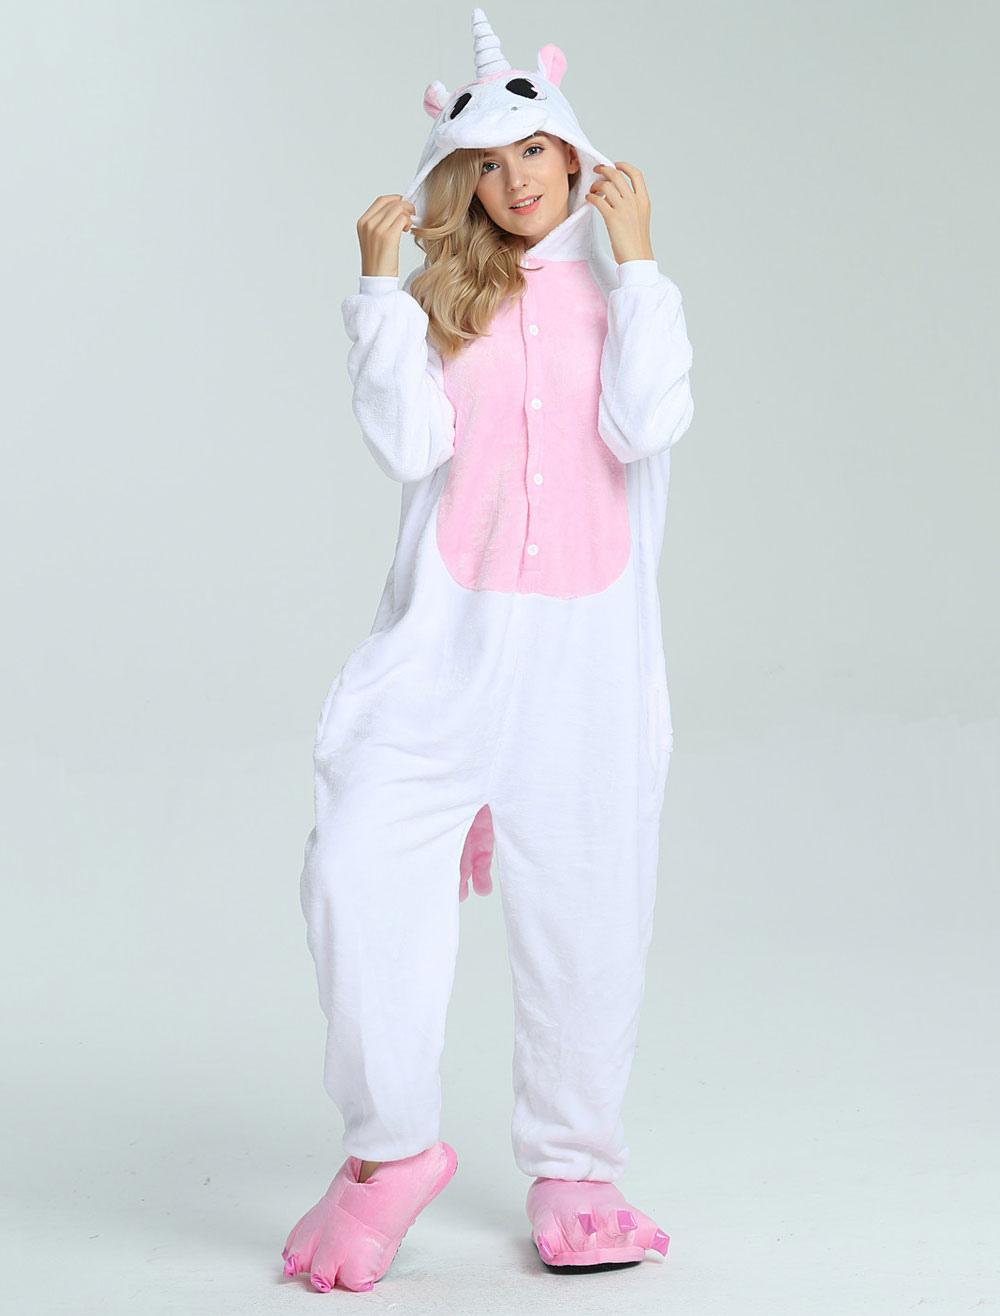 Buy Onesie Unicorn Kigurumi White Unisex Adults Winter Jumpsuit Halloween for $16.99 in Milanoo store